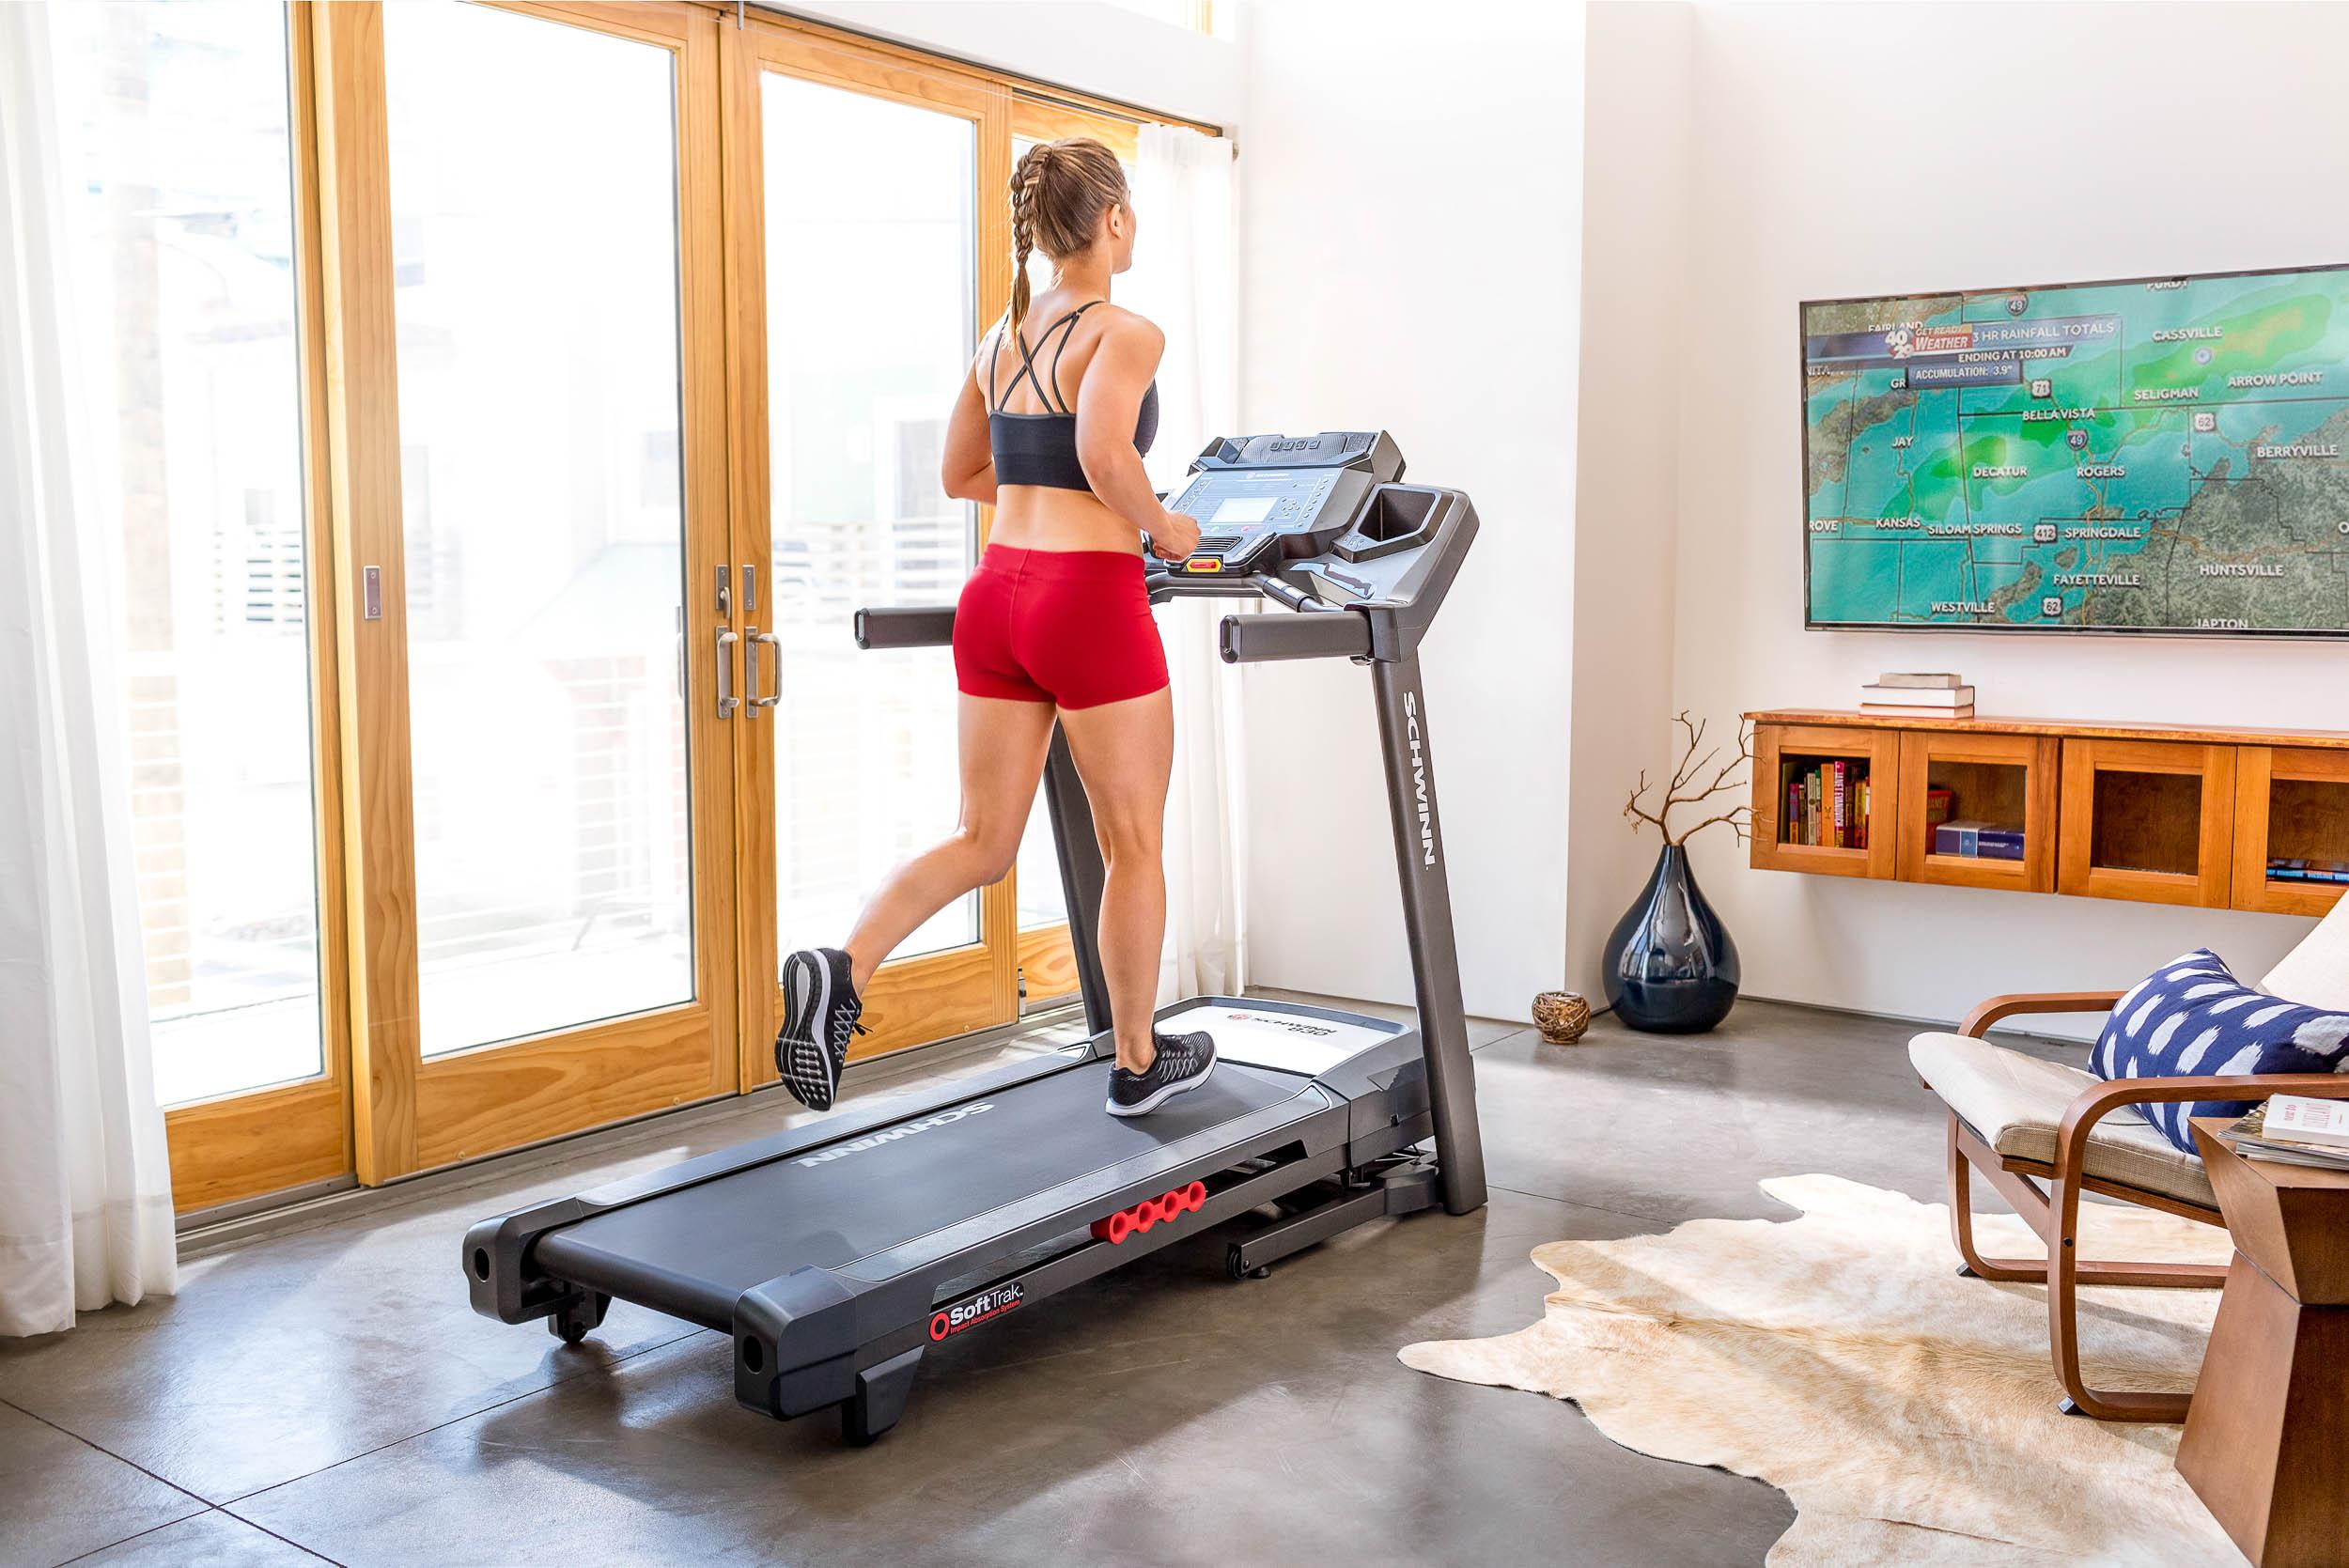 Nautilus_Direct_116099_Schwinn Treadmill T830 Rear 3-4 Julie_1278 copy.jpg